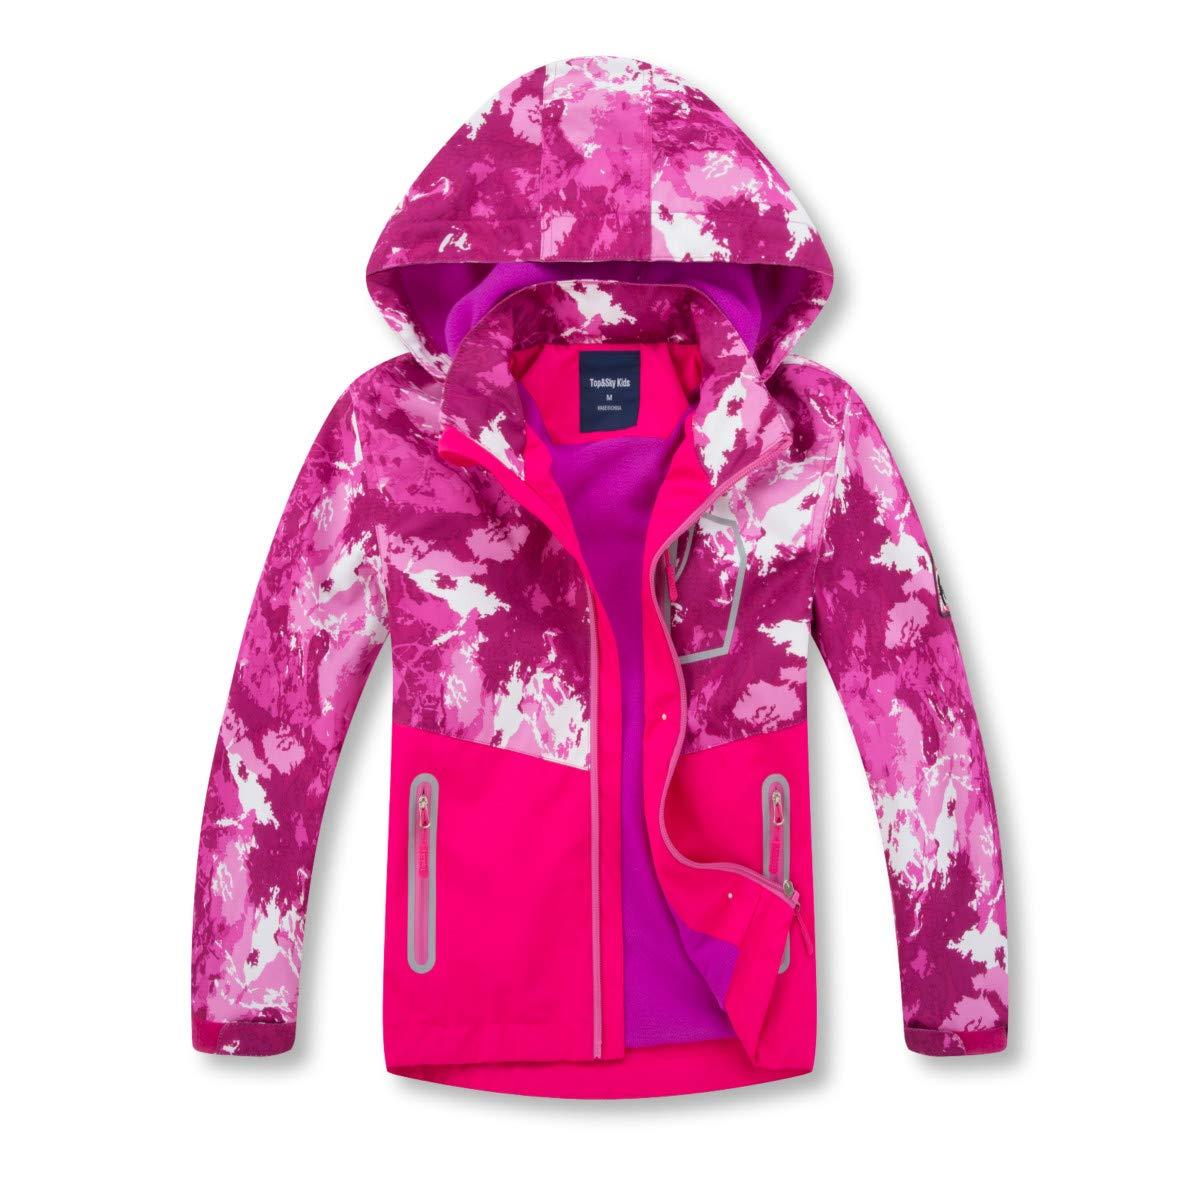 Girls Rain Jackets Lightweight Waterproof Hooded Raincoats Windbreakers for Kids Red 7/8 by ChooTeeYeen